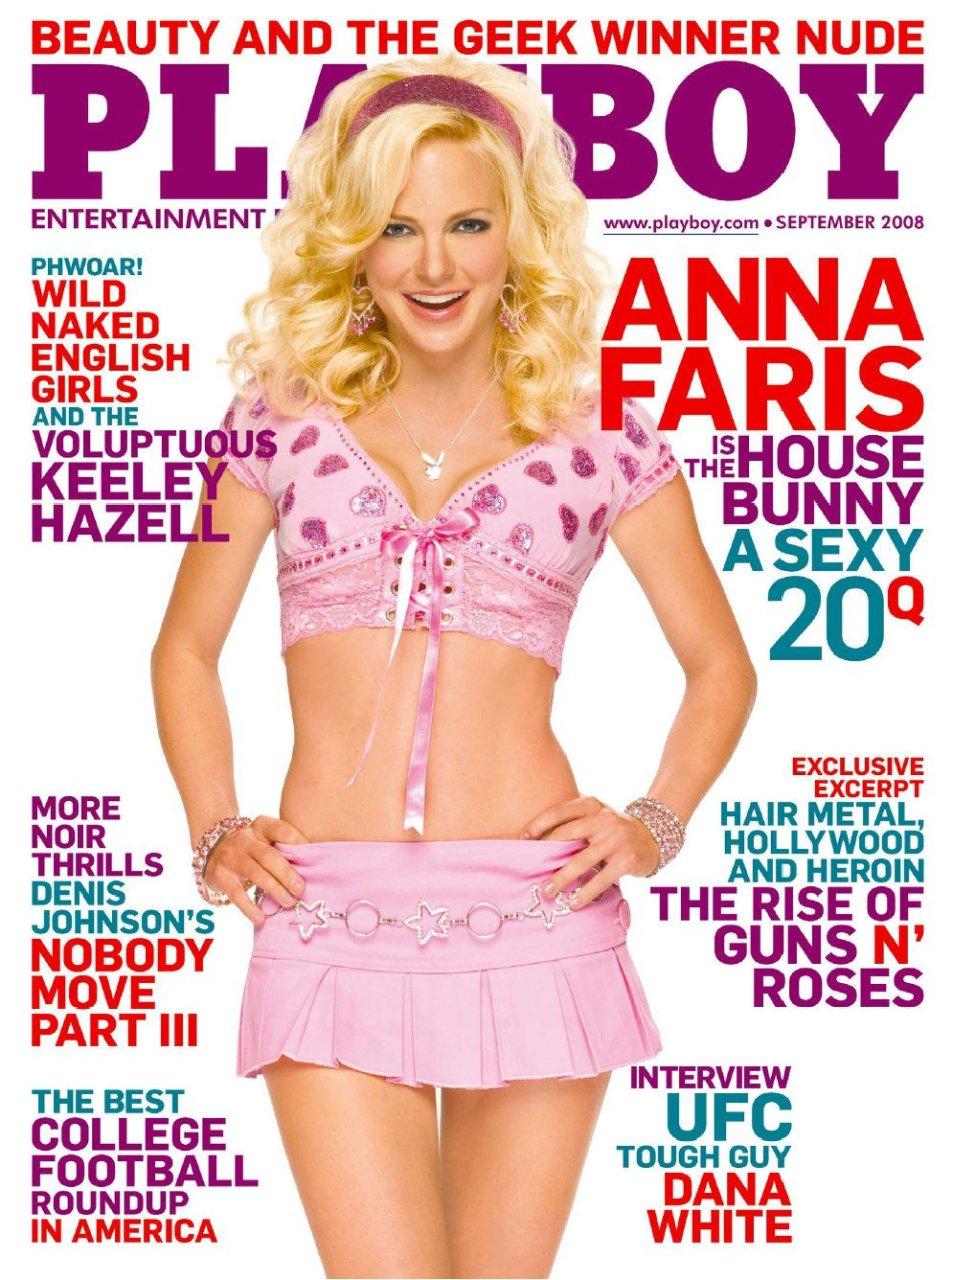 Faris Playboy Anna Nude#5